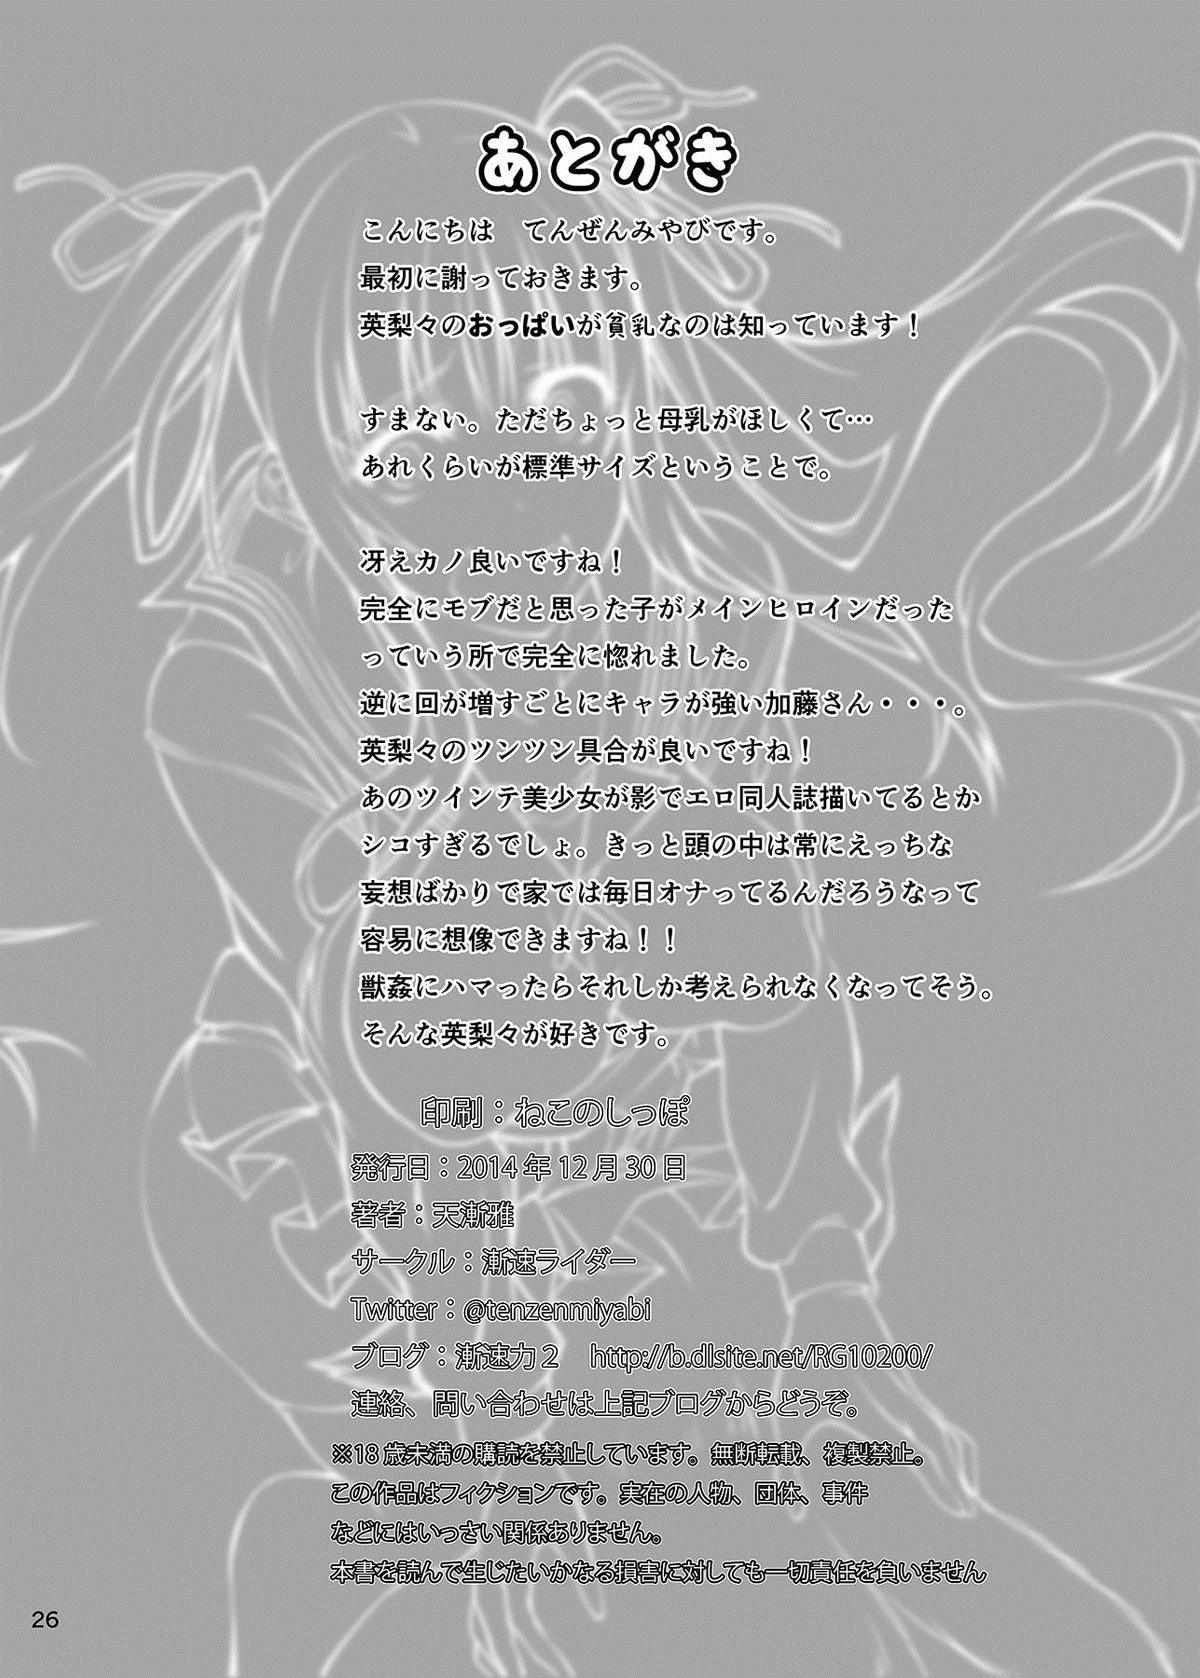 HentaiVN.net - Ảnh 25 - Juukan Kanojo no Tsukurikata - 獣姦彼女の作りかた - Oneshot